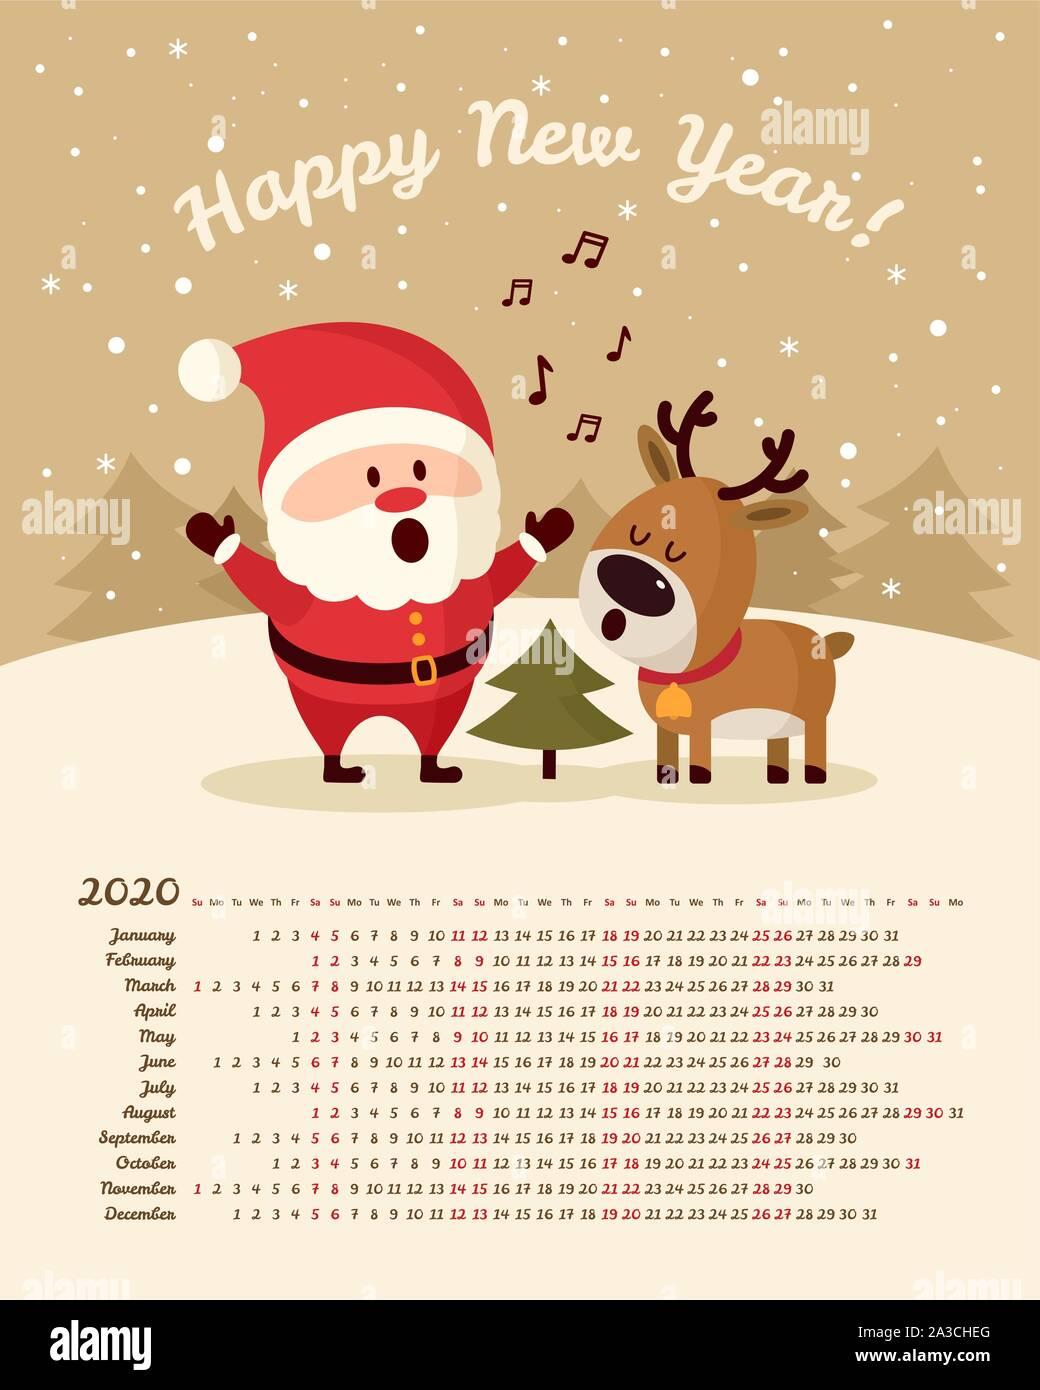 Christmas Santa Claus In July Sales 2020 Calendar 2020 year. Santa Claus with deer singing near Christmas